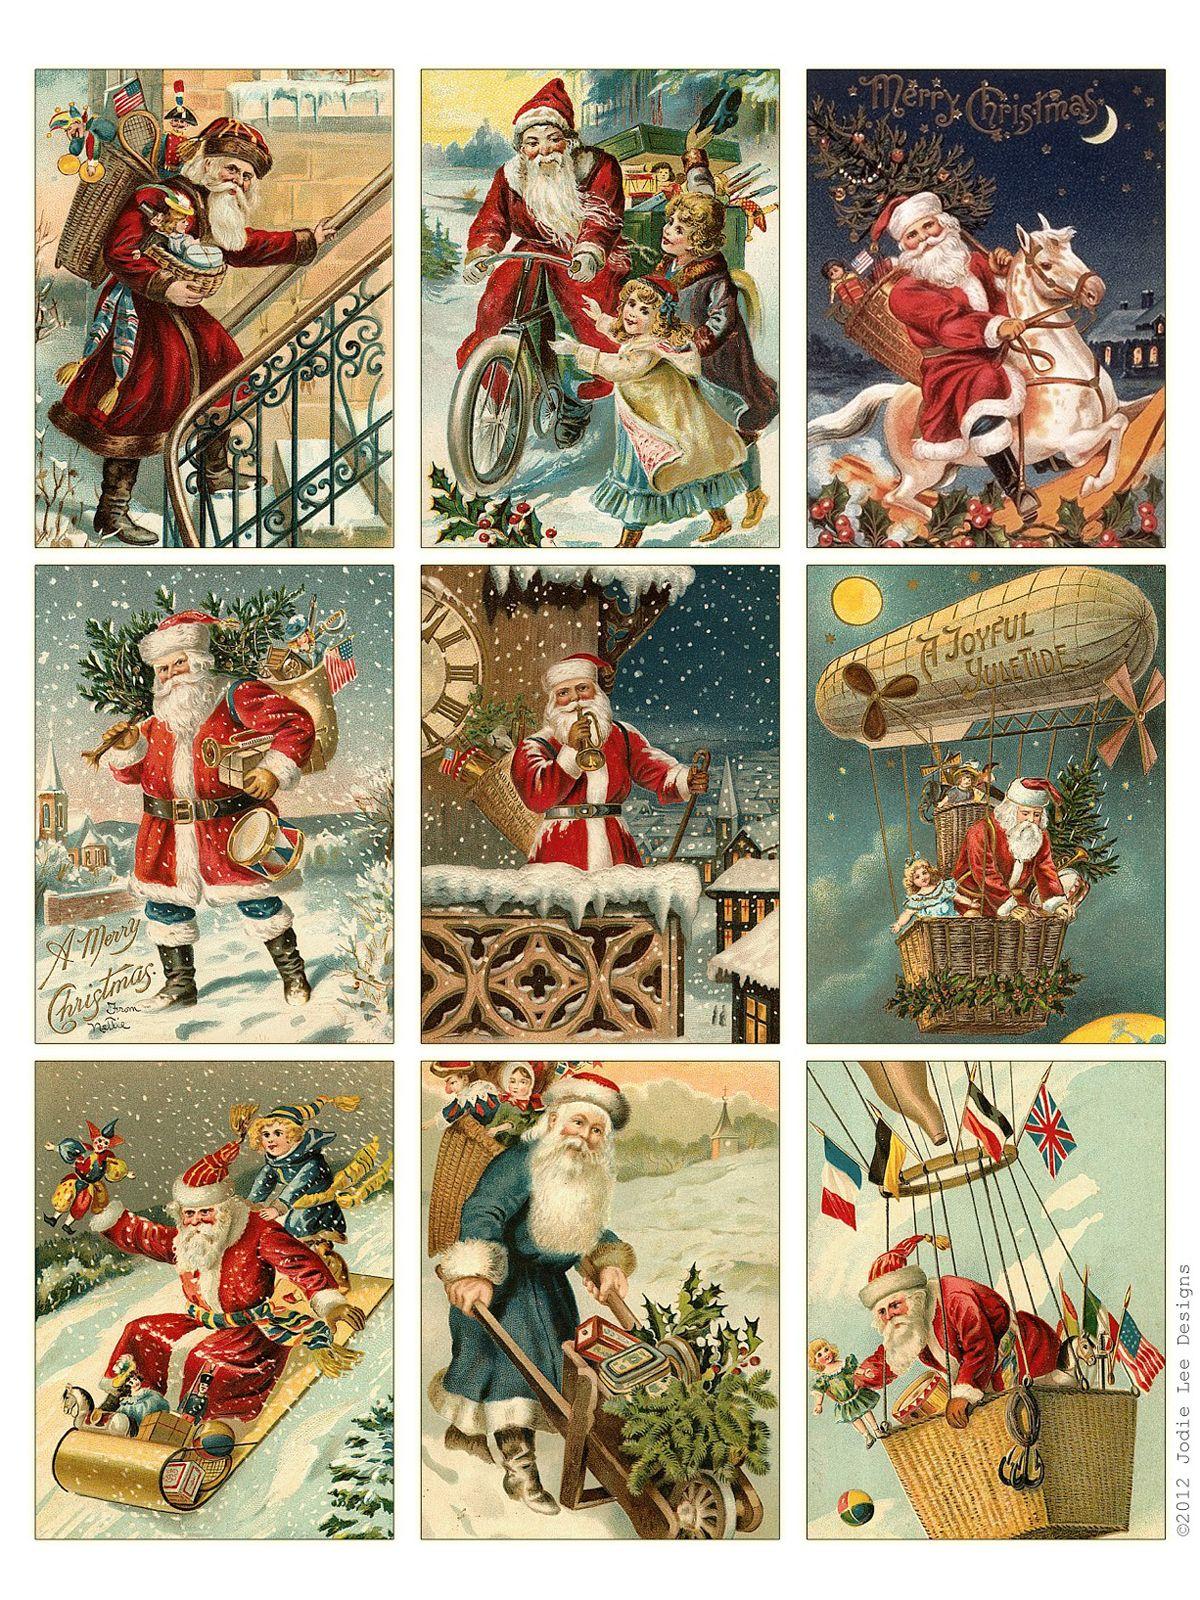 38 Free Christmas Printables Holiday Cards And Gift Tags To Print